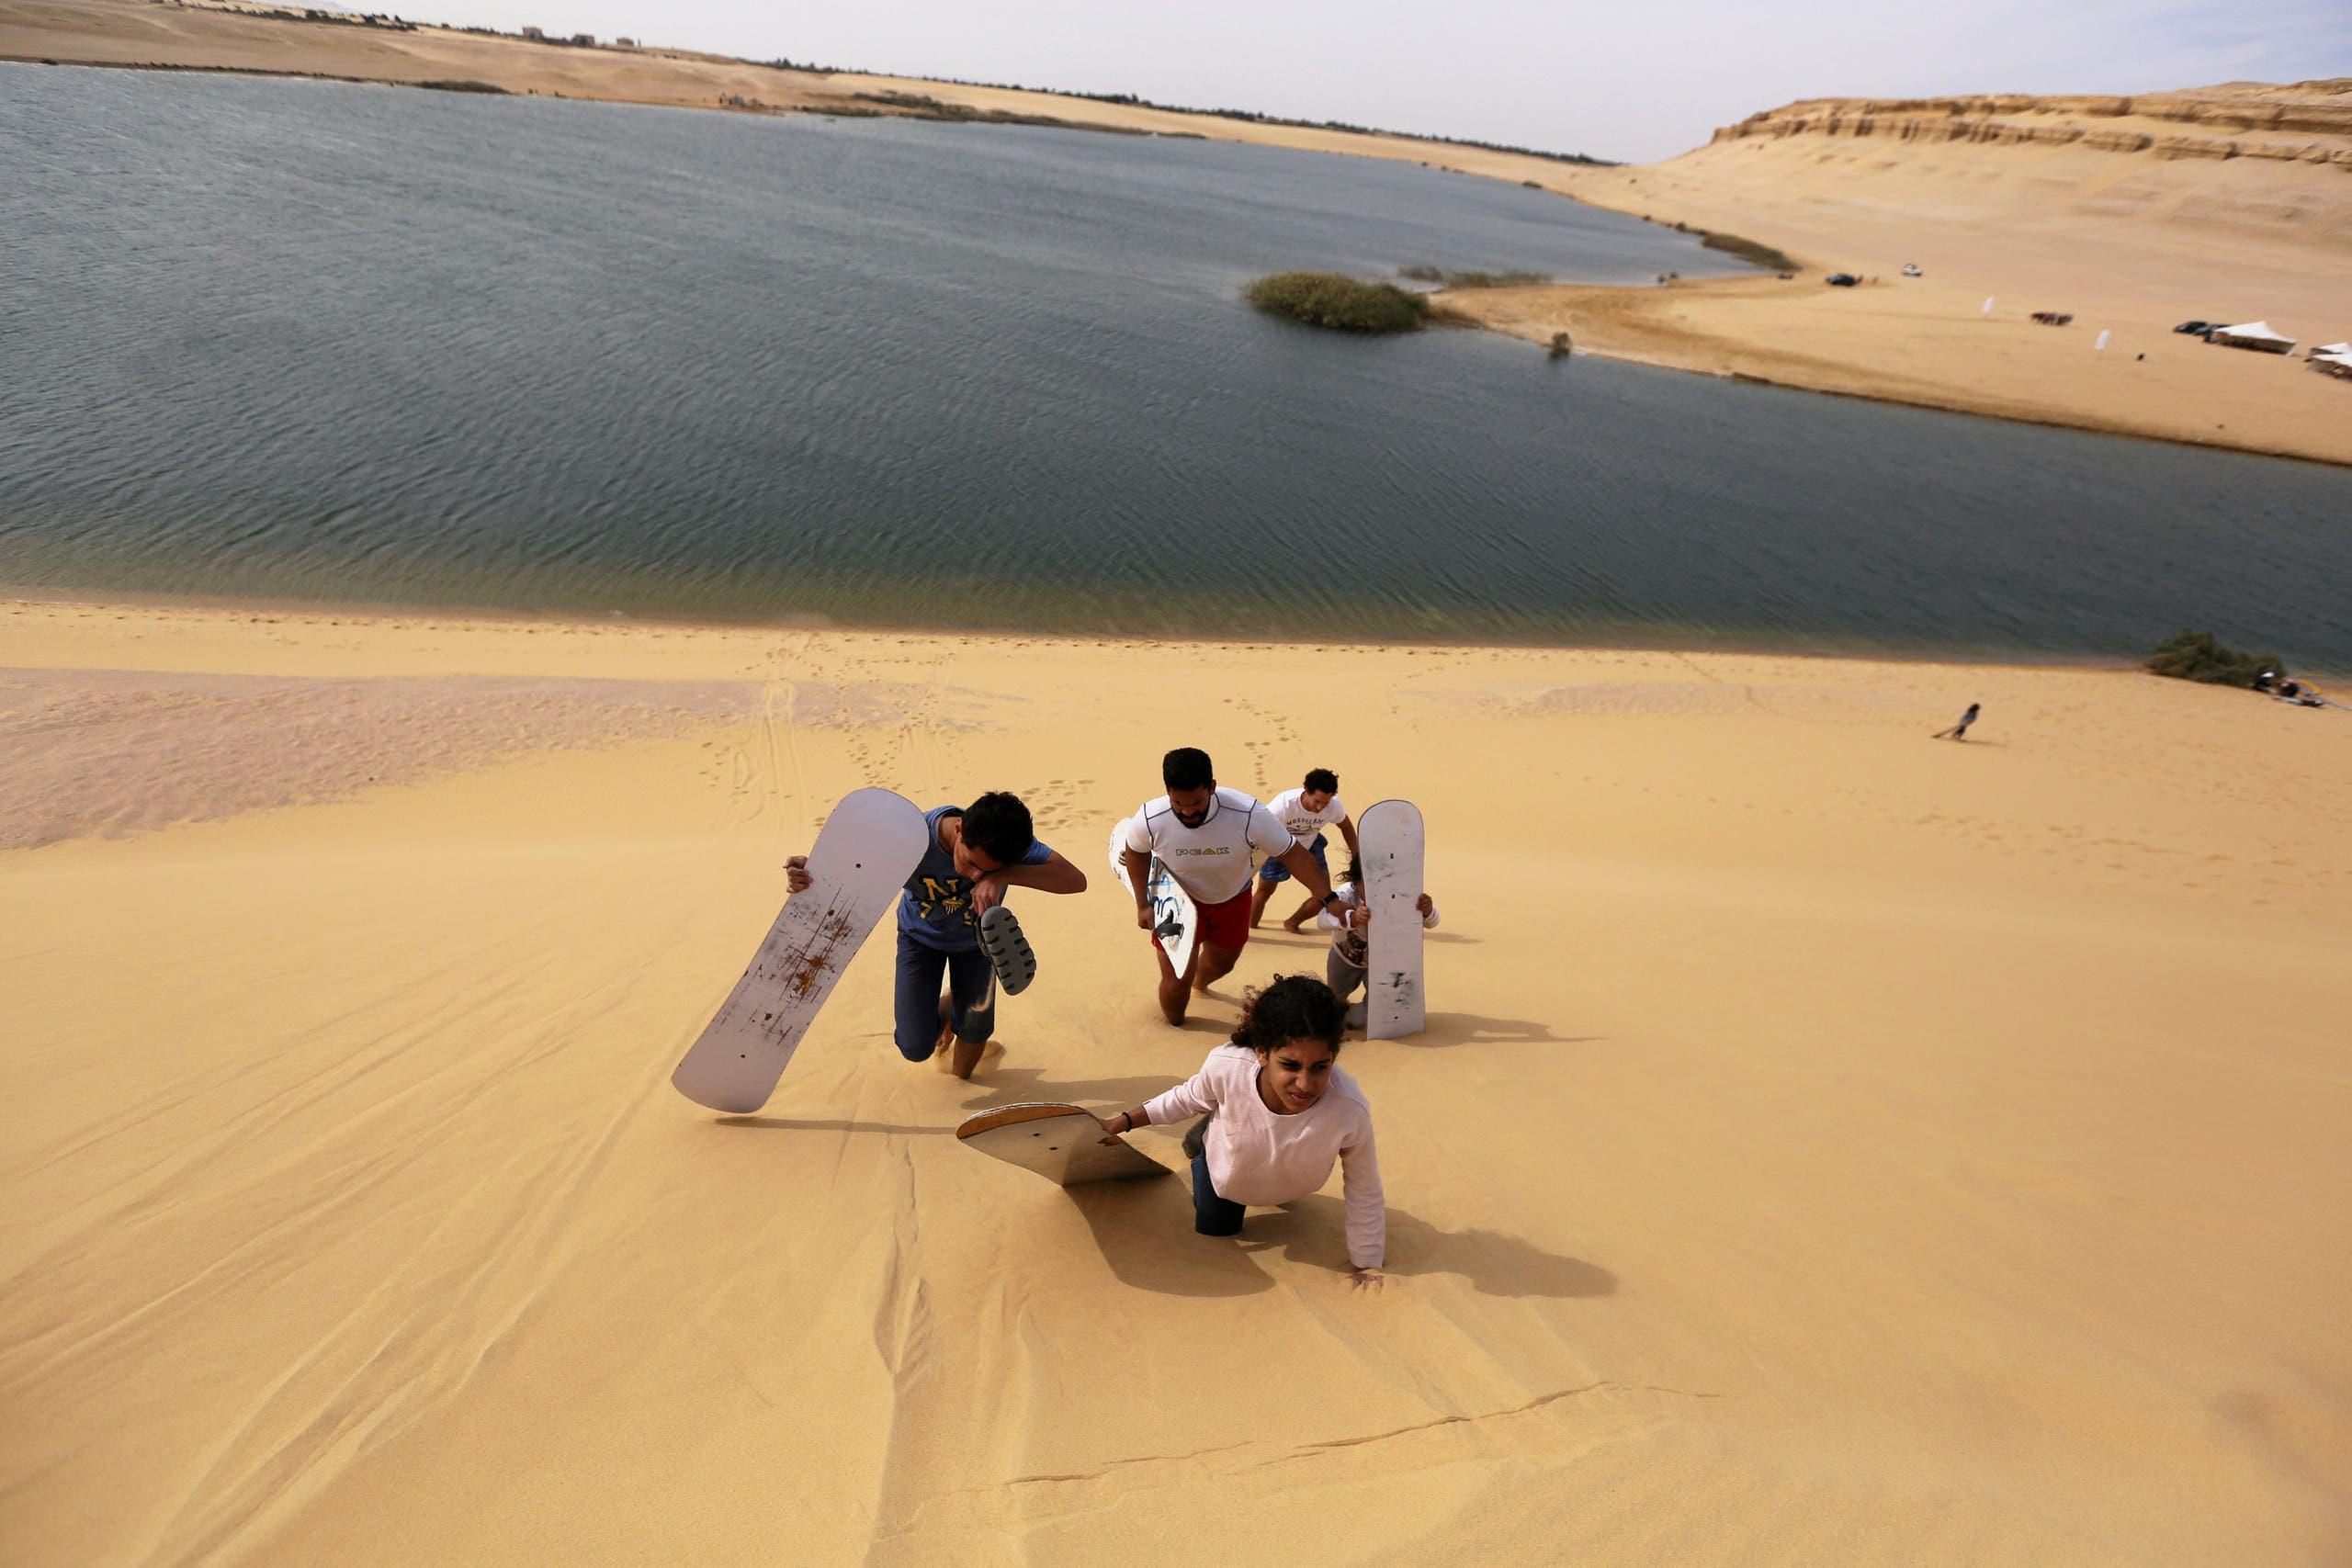 Desert adventures at Egypt's Wadi al Rayan